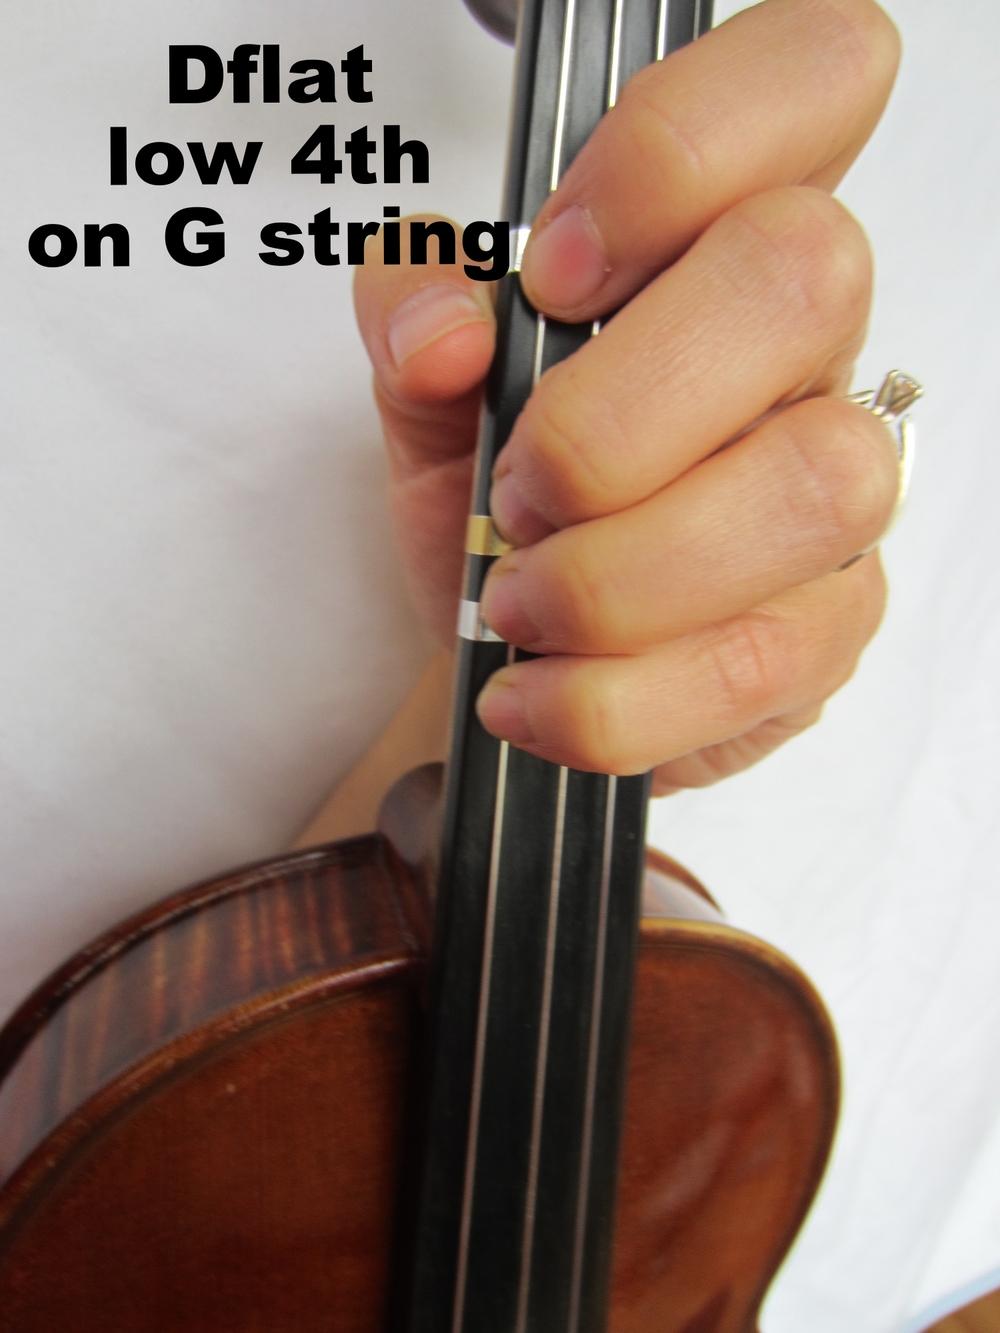 Violin Fingering Dflat on G.JPG